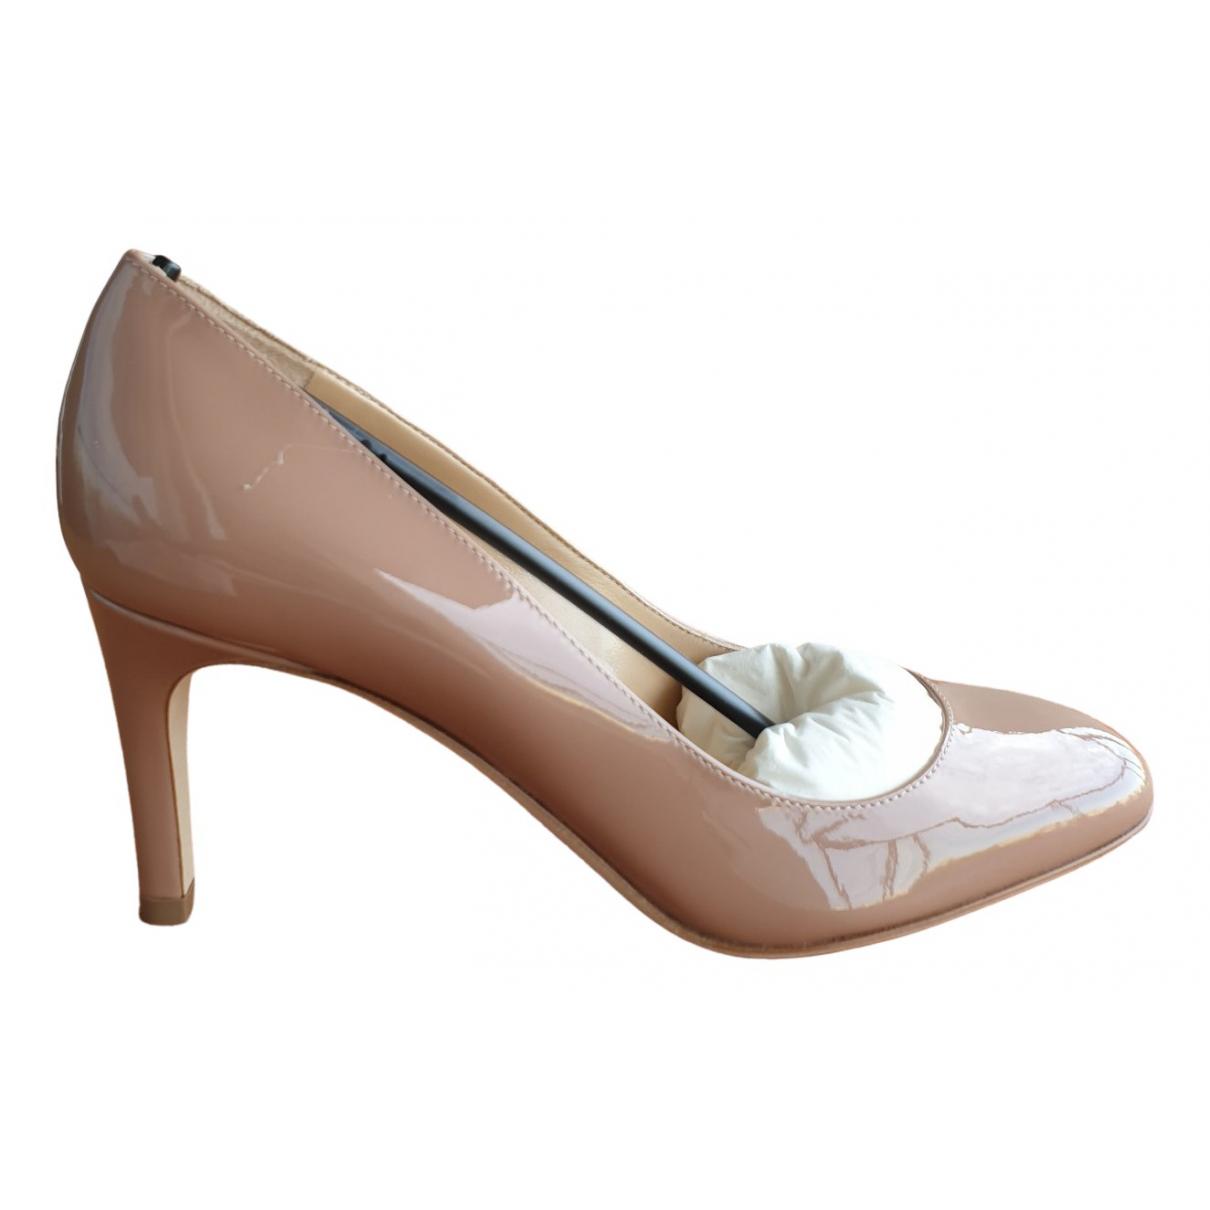 Sergio Rossi \N Beige Patent leather Heels for Women 35 IT